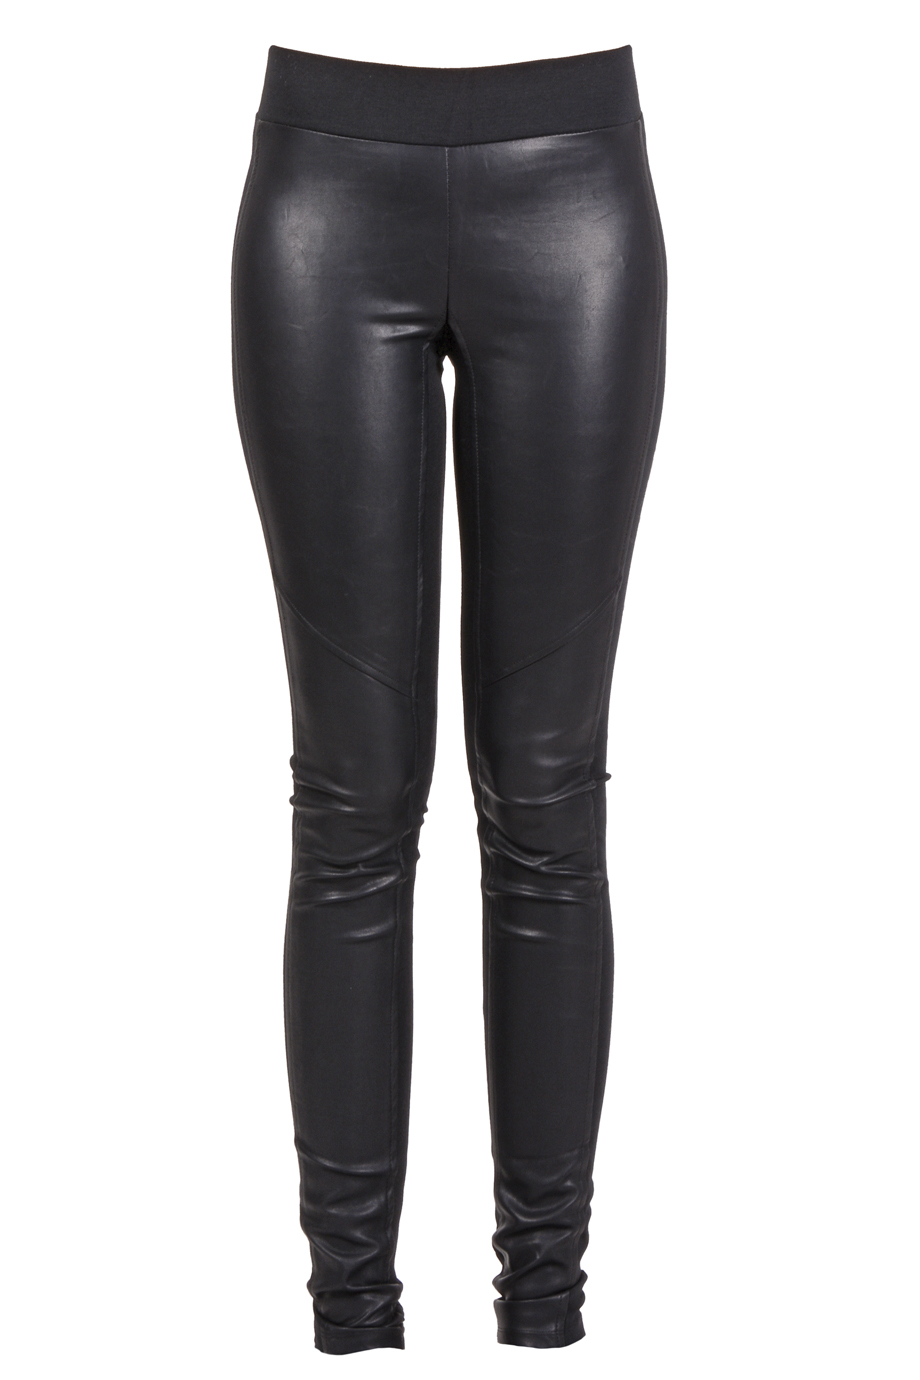 SWEEWË TALIA Black Eco-Leather Leggings - CLOTHING | FASHION LEGGINGS | PRET-A-BEAUTE.COM